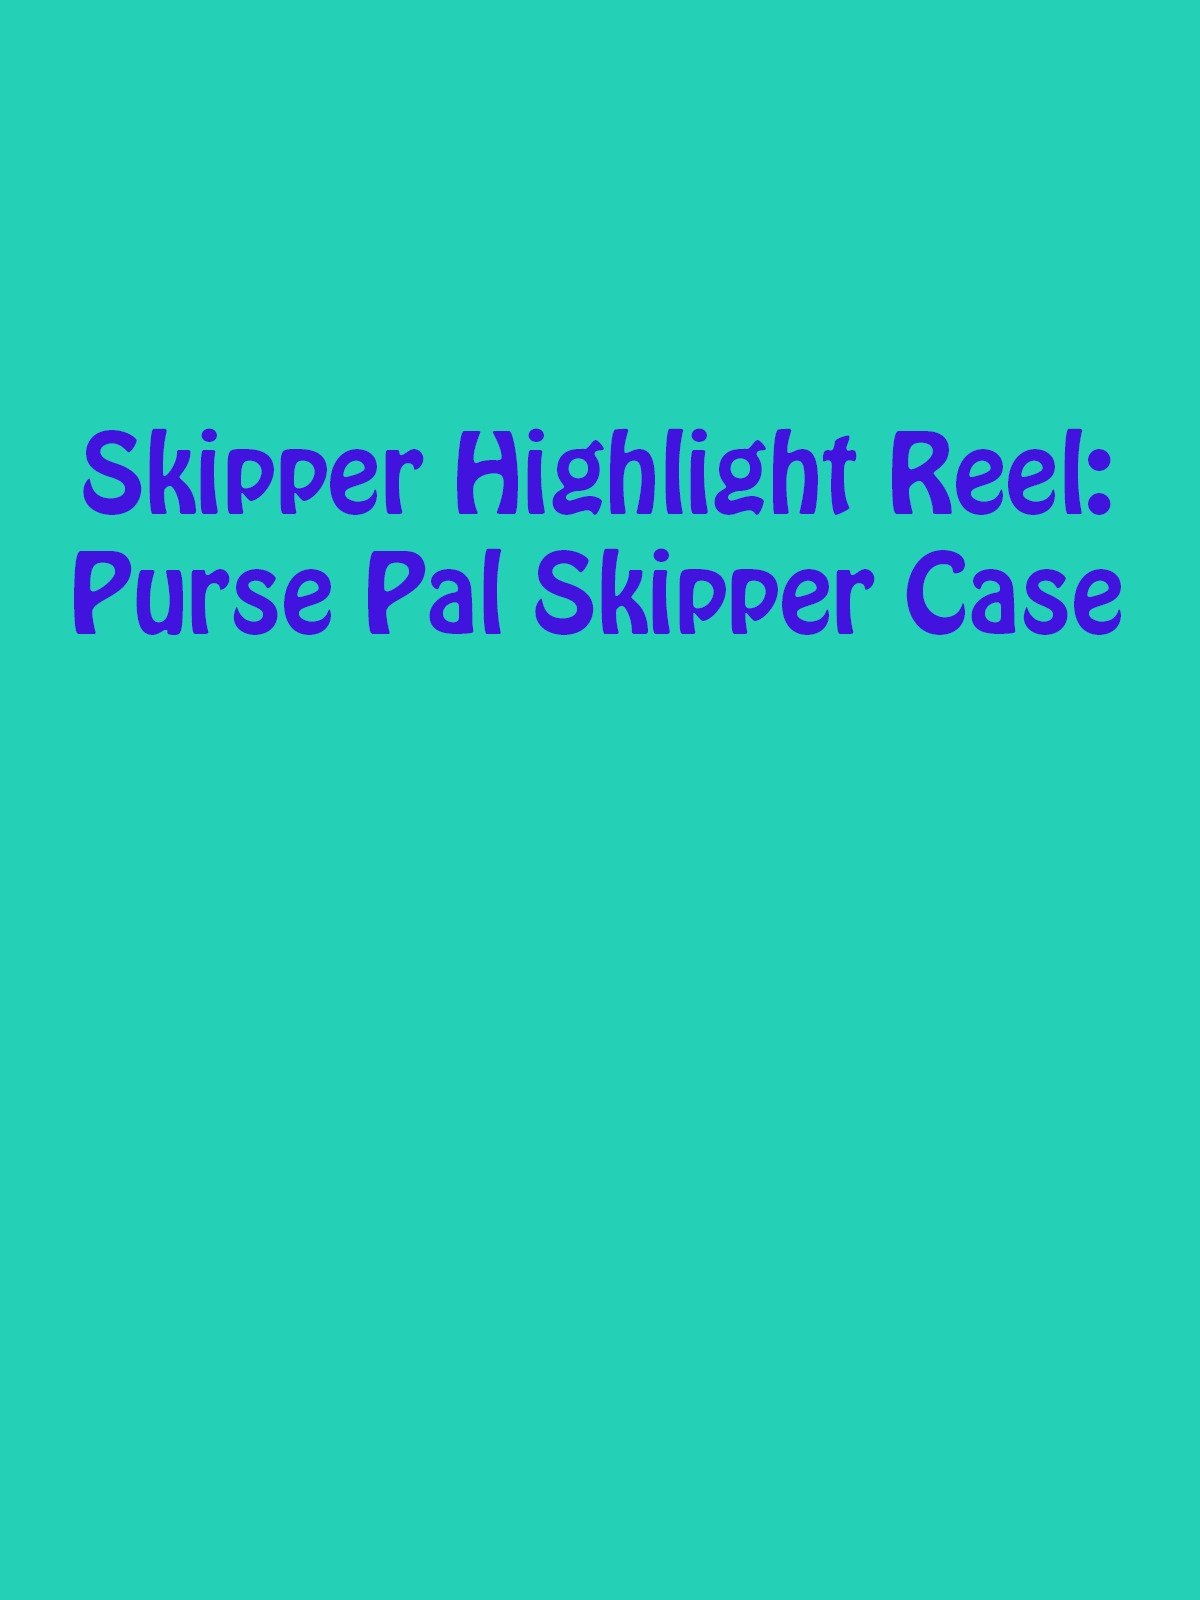 Review: Skipper Highlight Reel: Purse Pal Skipper Case on Amazon Prime Video UK